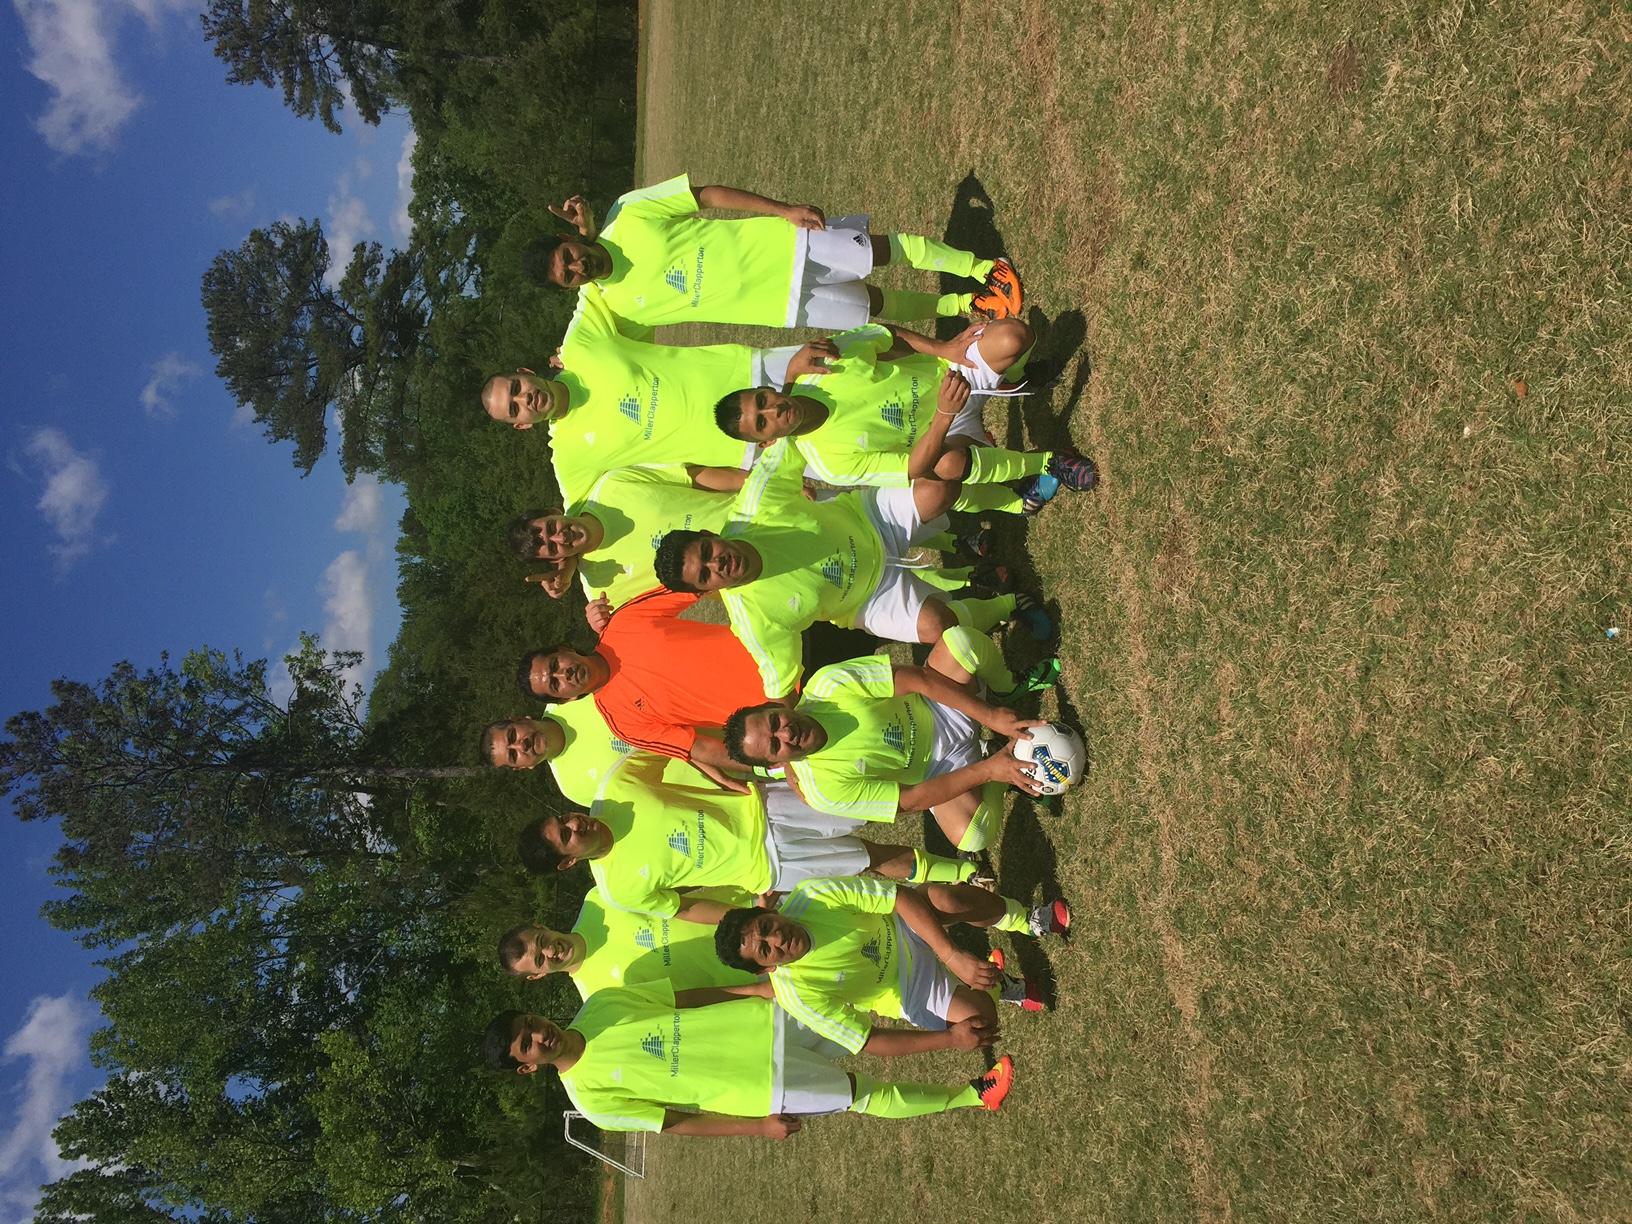 MillerClapperton Soccer Team